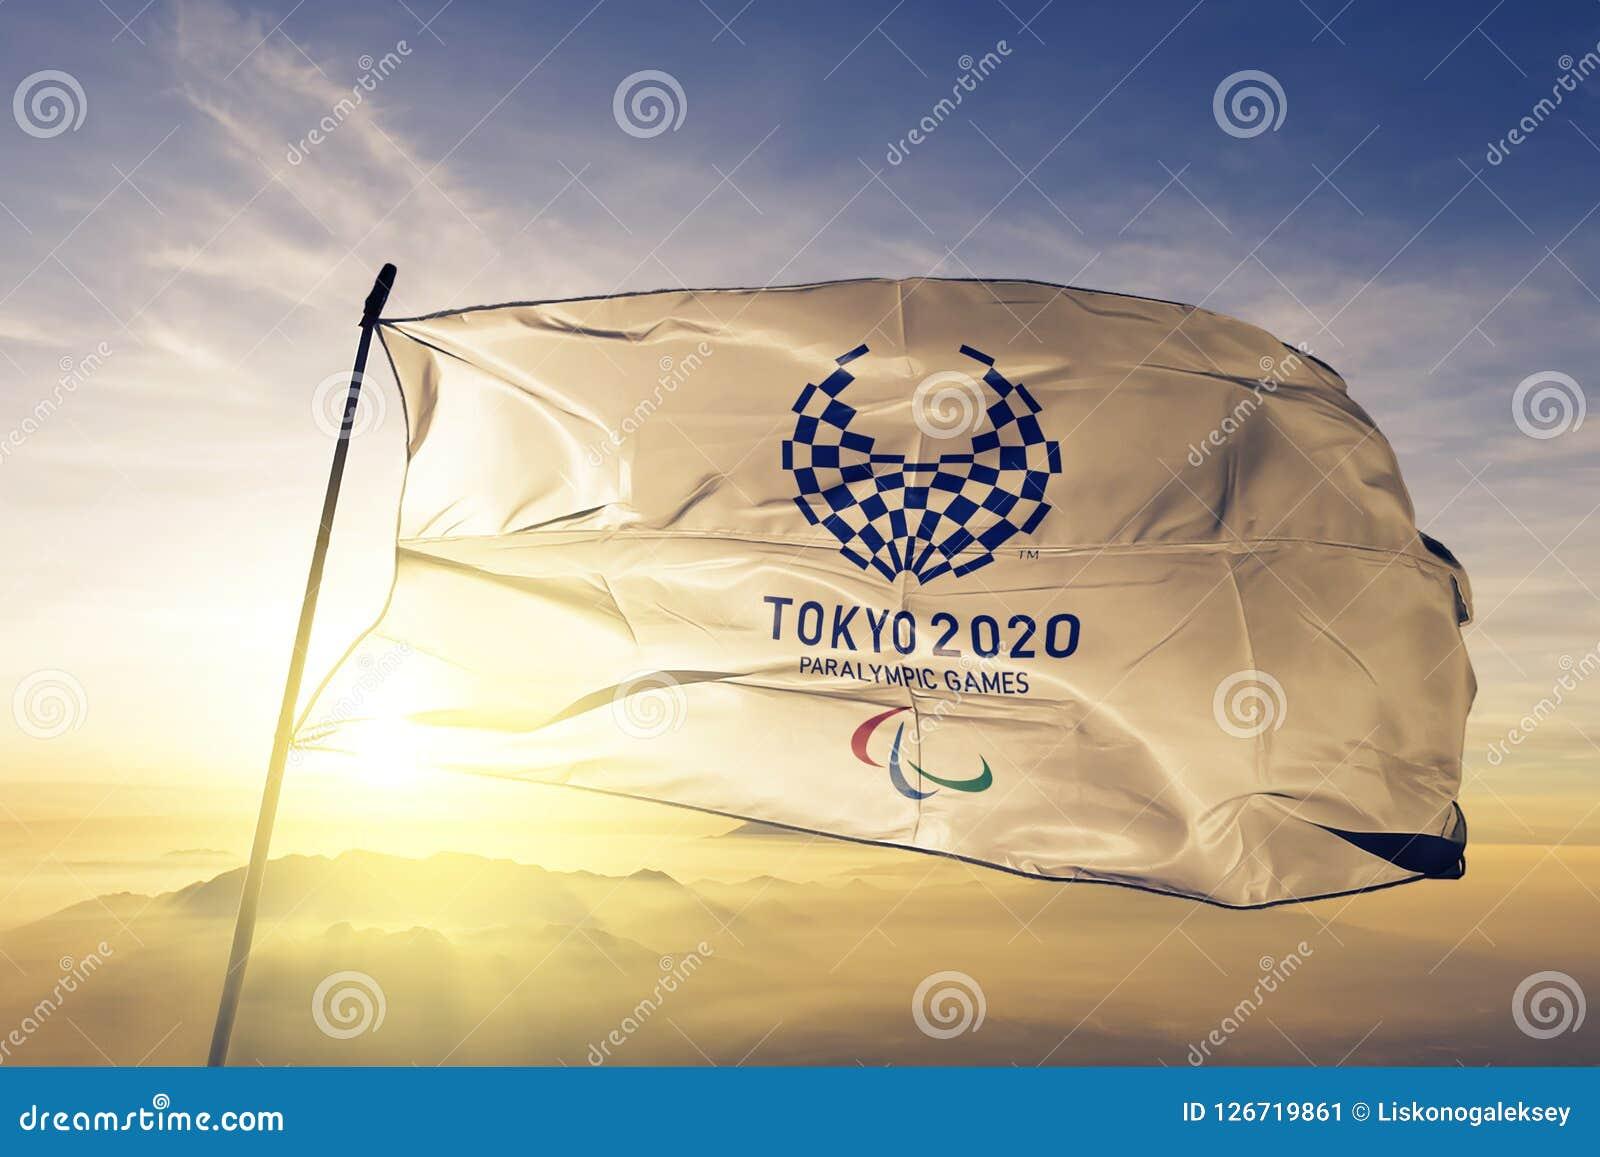 2020 Summer Paralympics Emblem flag textile cloth fabric waving on the top sunrise mist fog